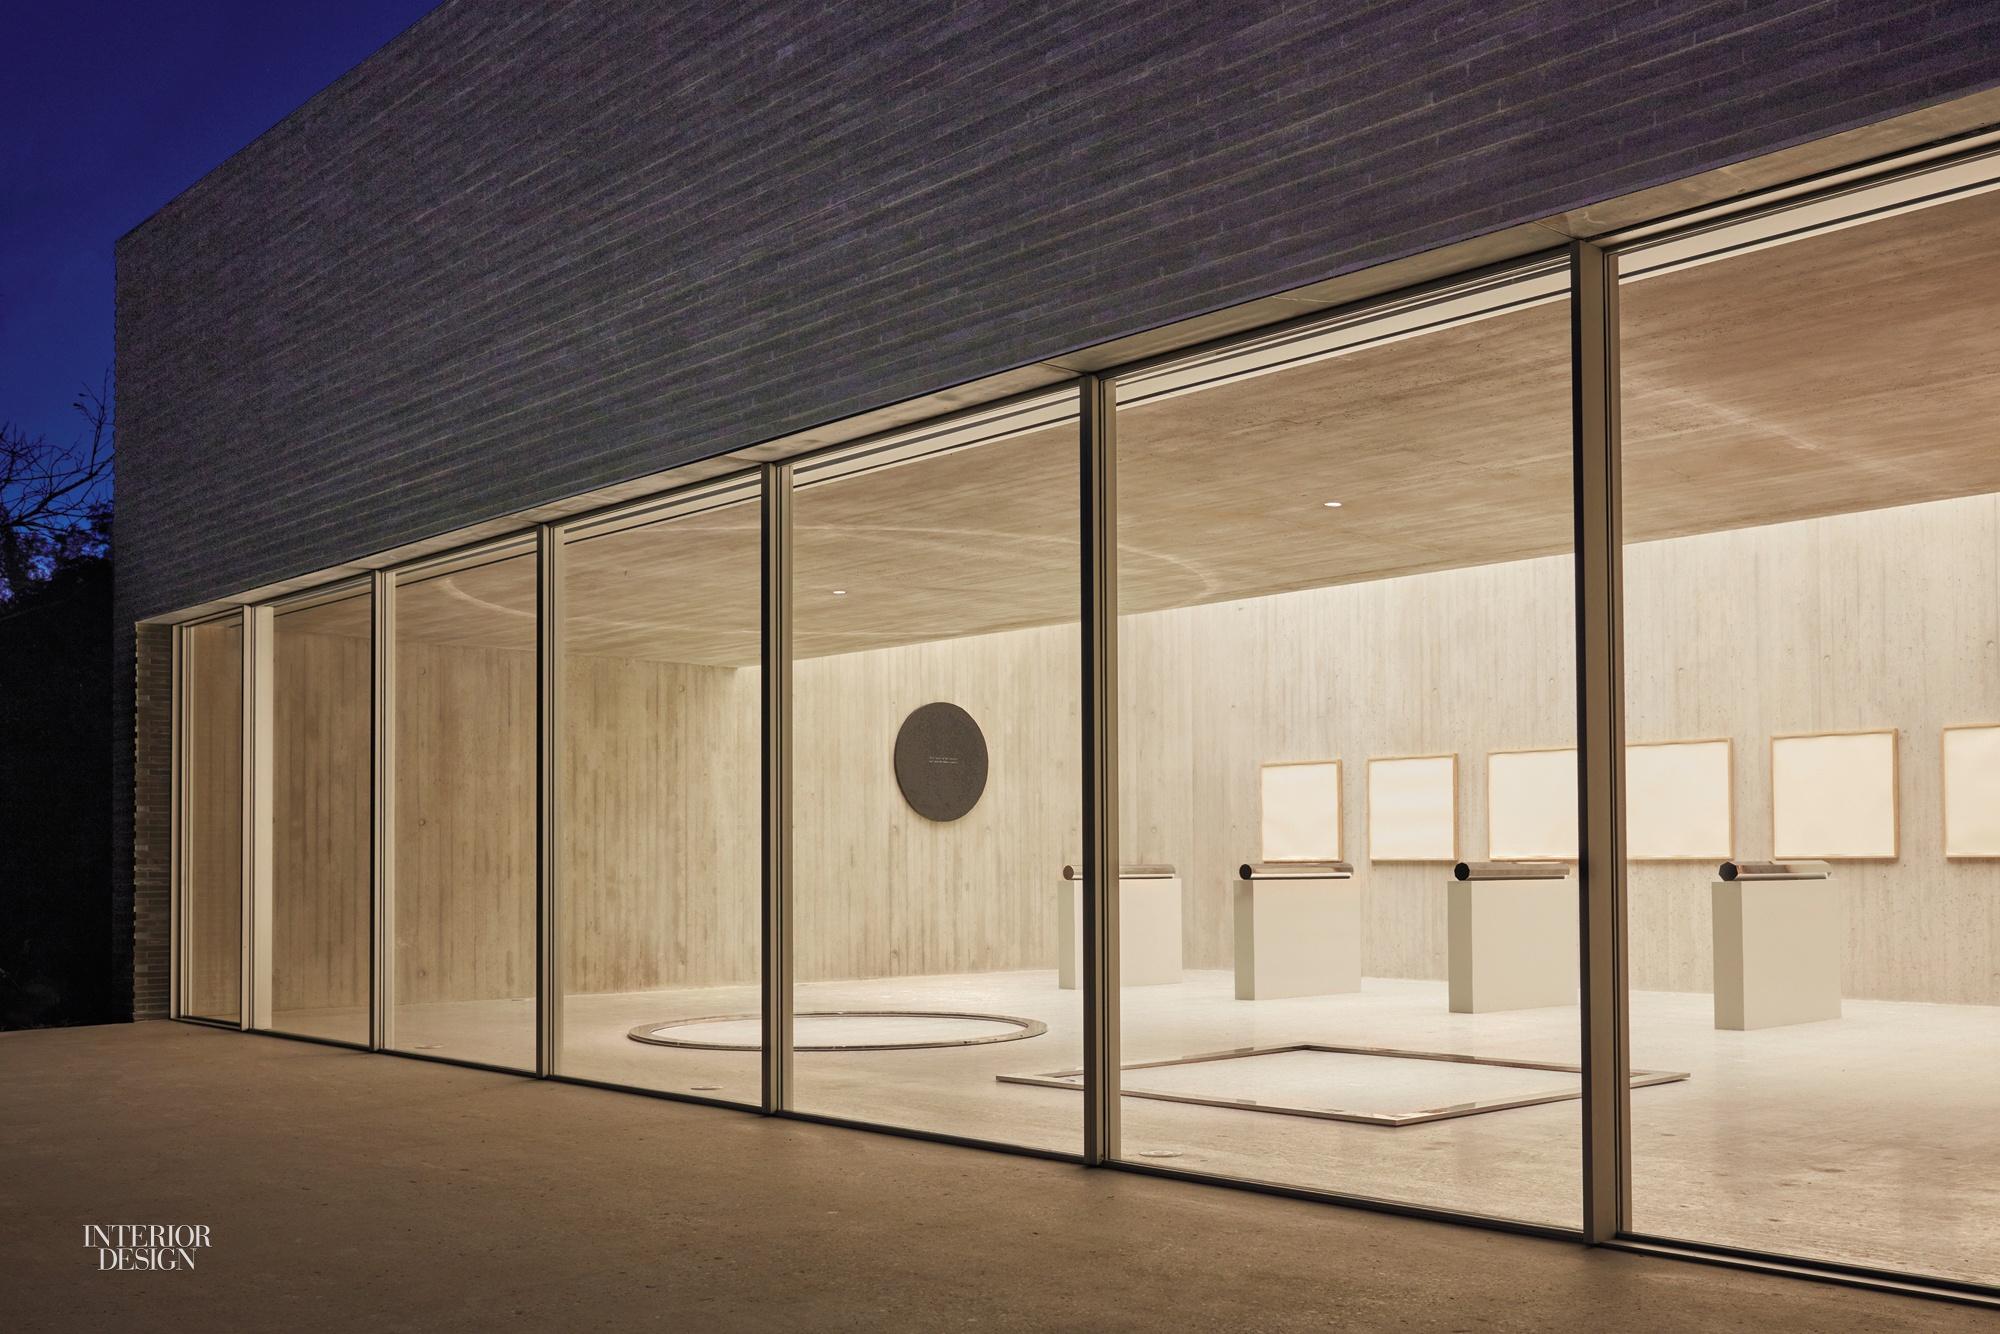 Gluckman Tang Architects Designs Artful Walter De Maria Pavilion in ...